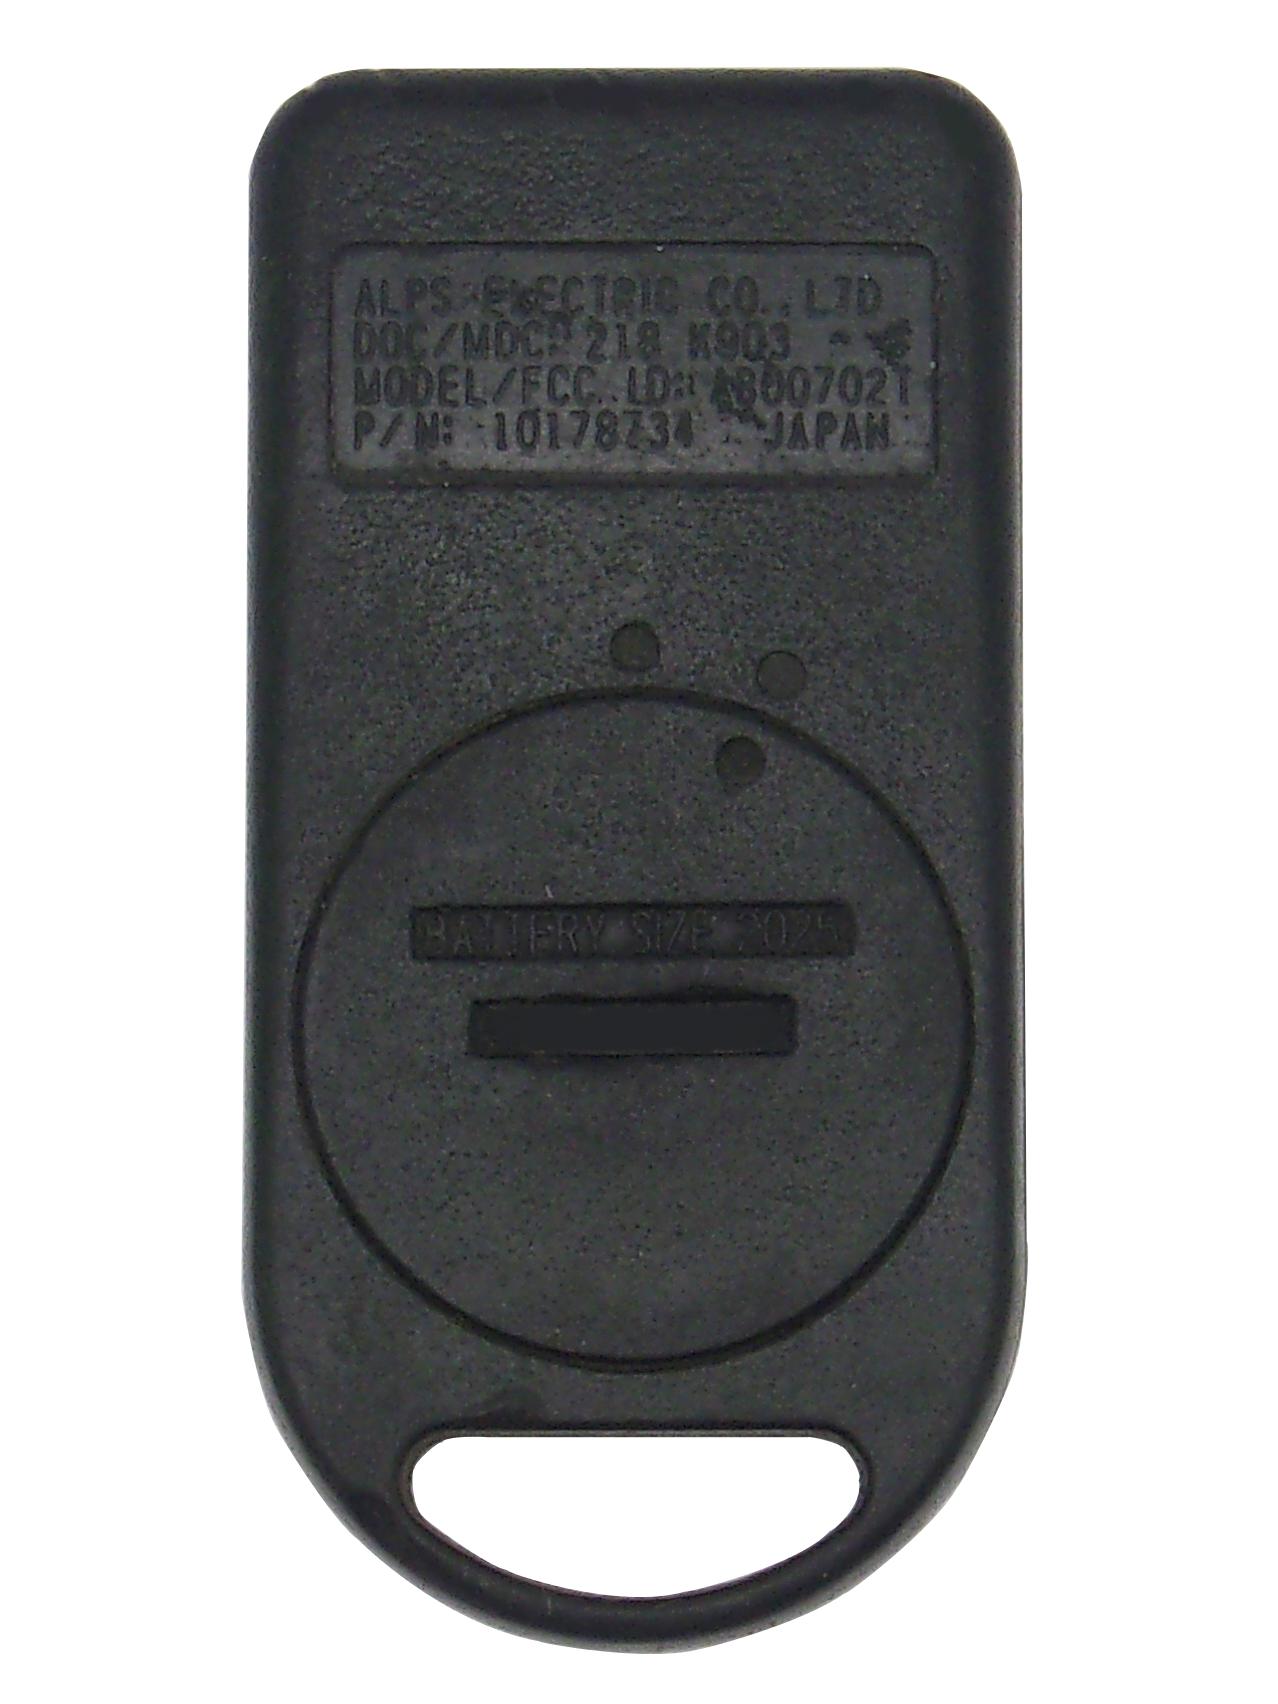 GM Keyless Entry Remote - 4 Button